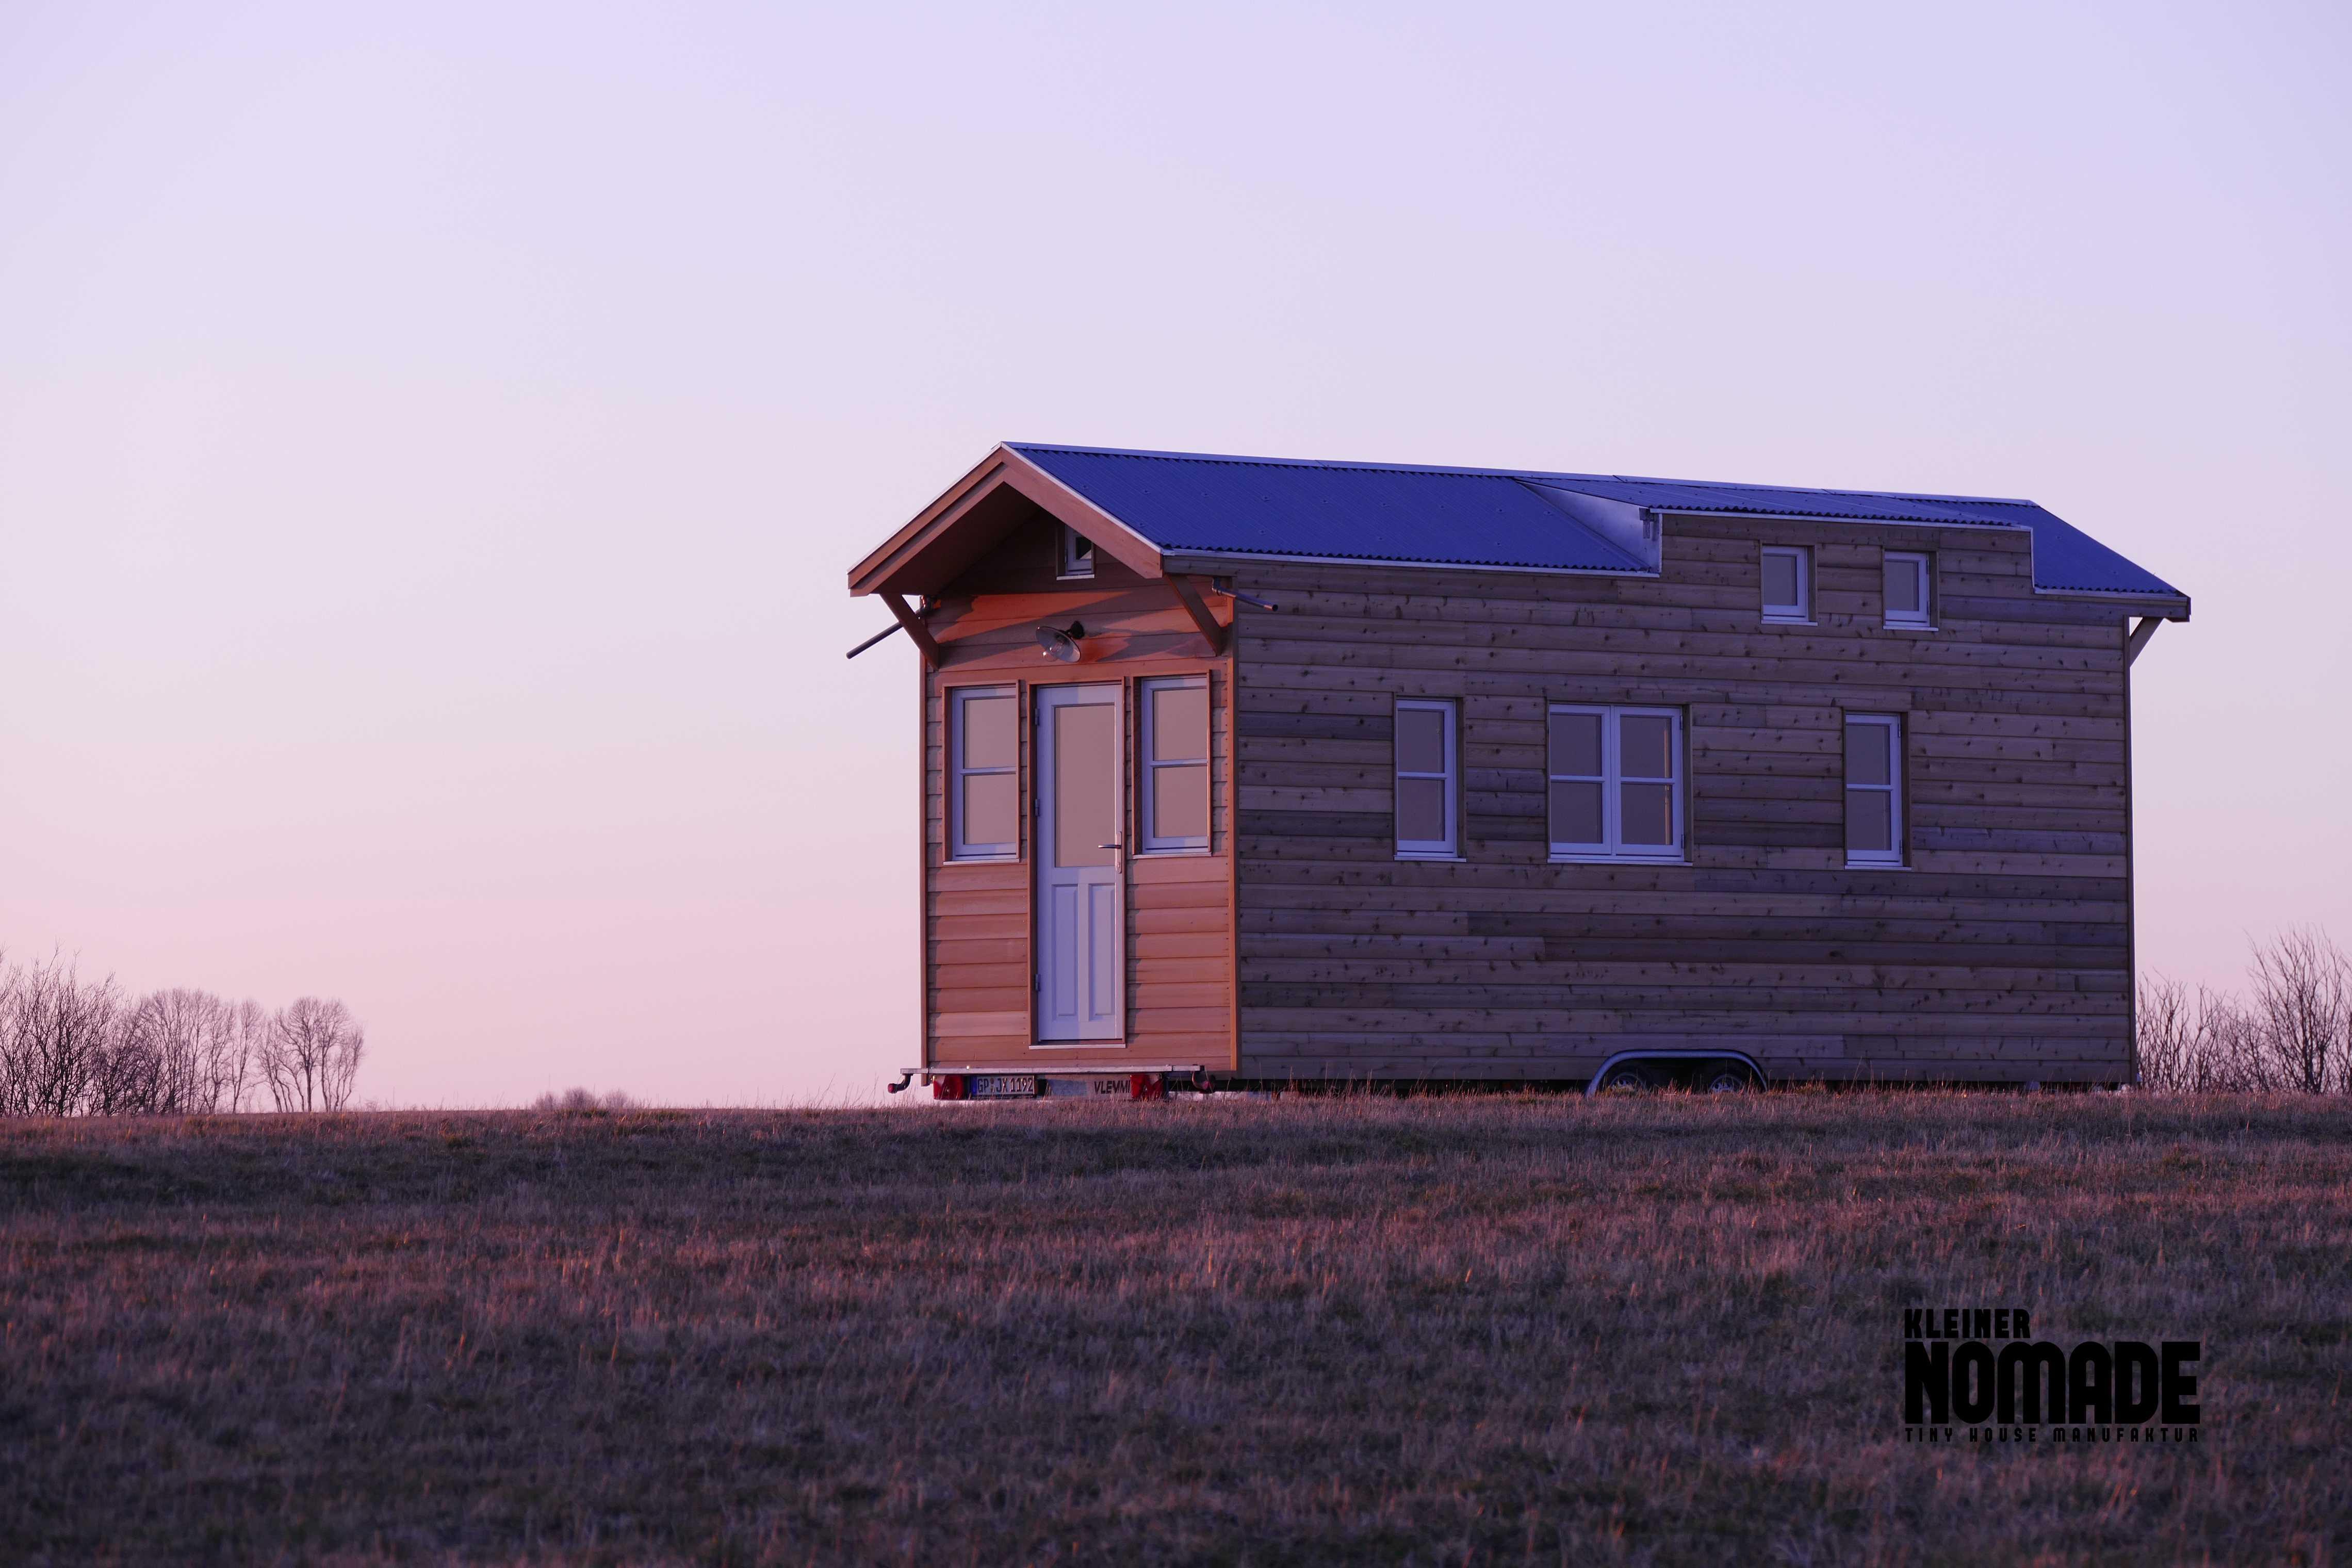 Sprossenfenster Kleiner Nomade Tiny Hous